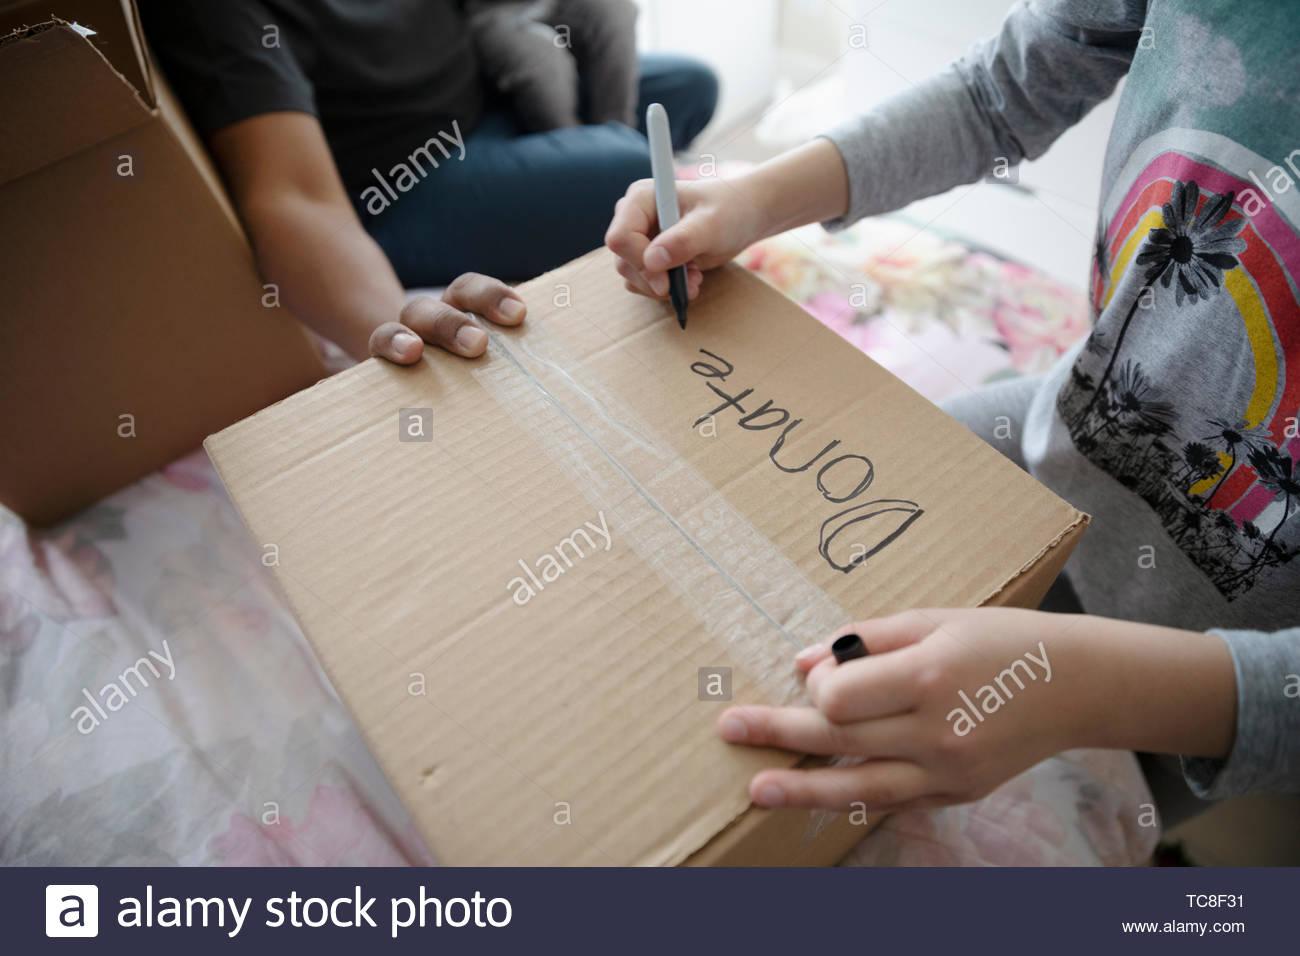 Chica escrito sobre caja de donación Imagen De Stock